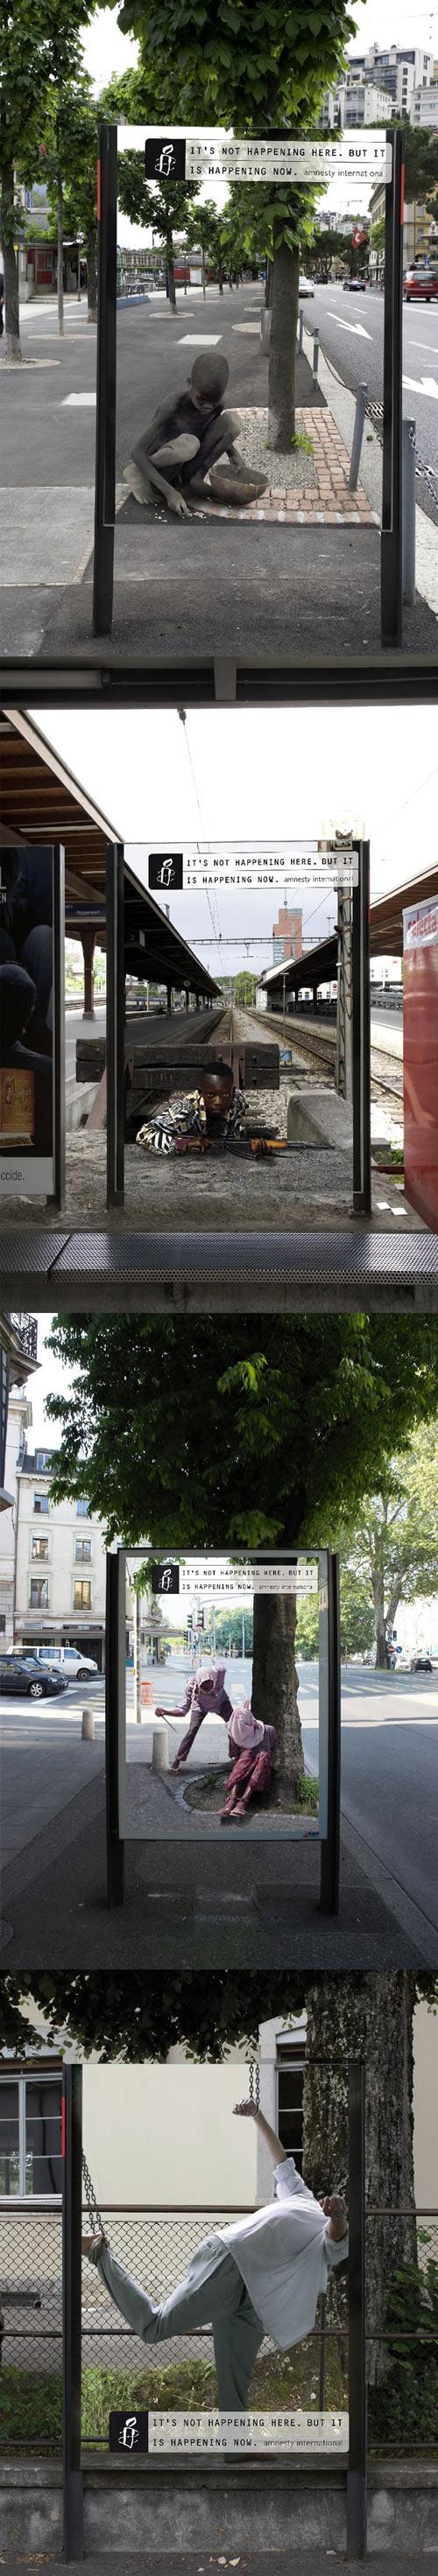 cool-publicity-Amnesty-international